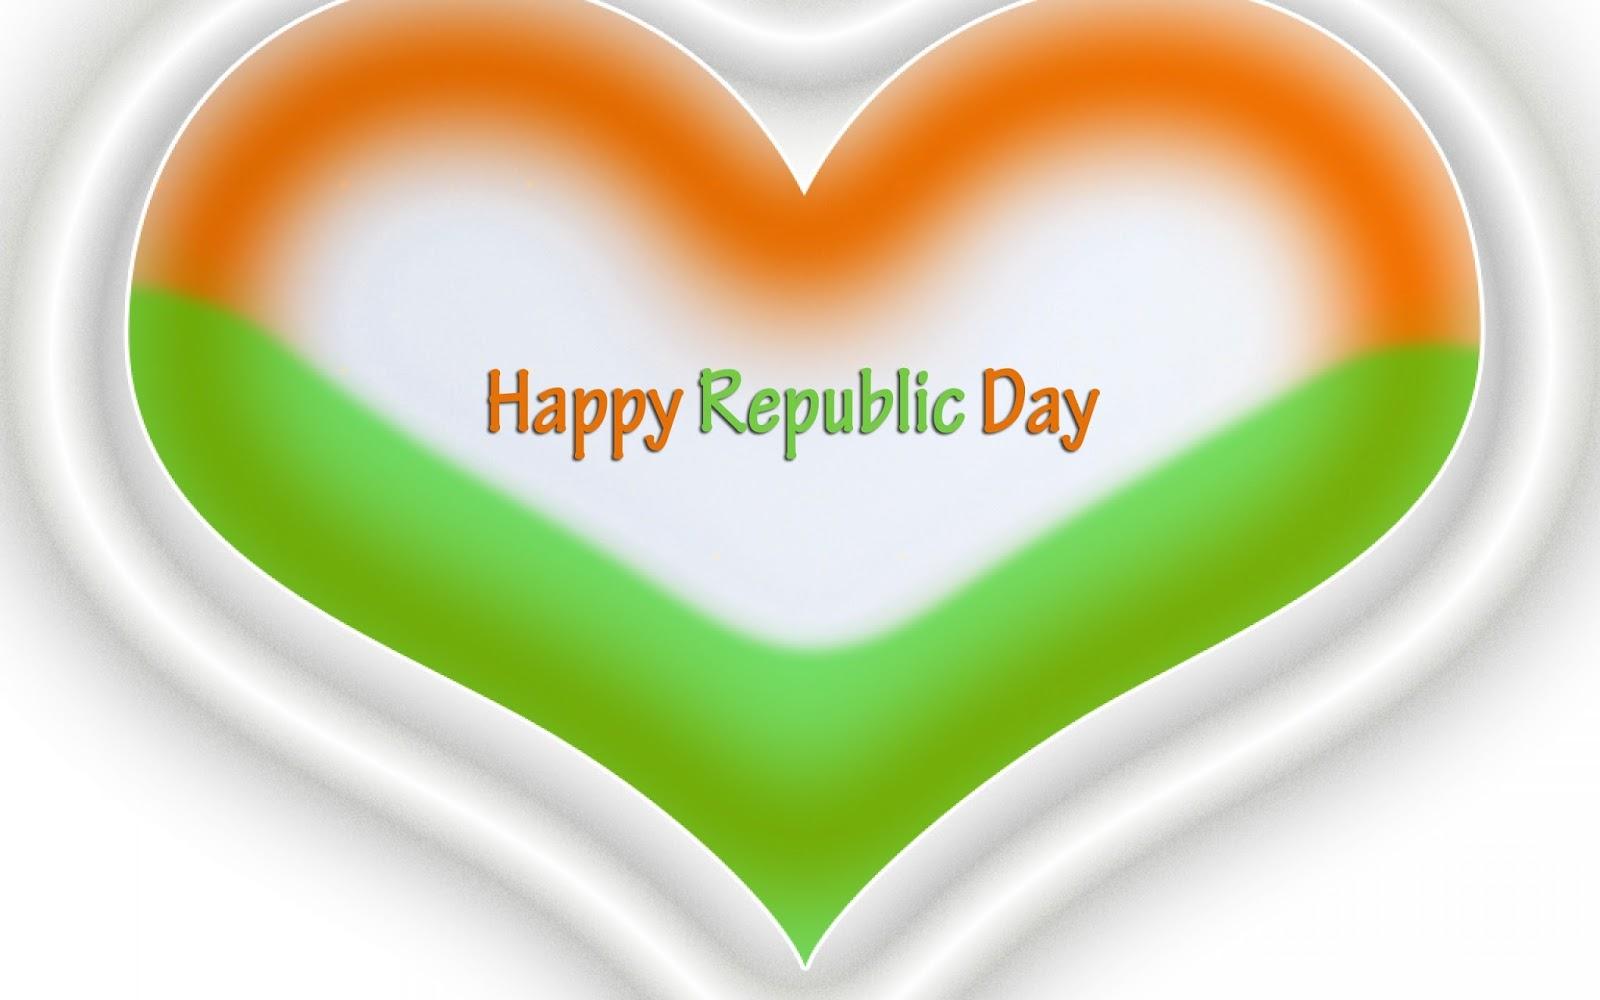 26 Jan Republic Day Images Free Download Shayari Hindi Girlfriend